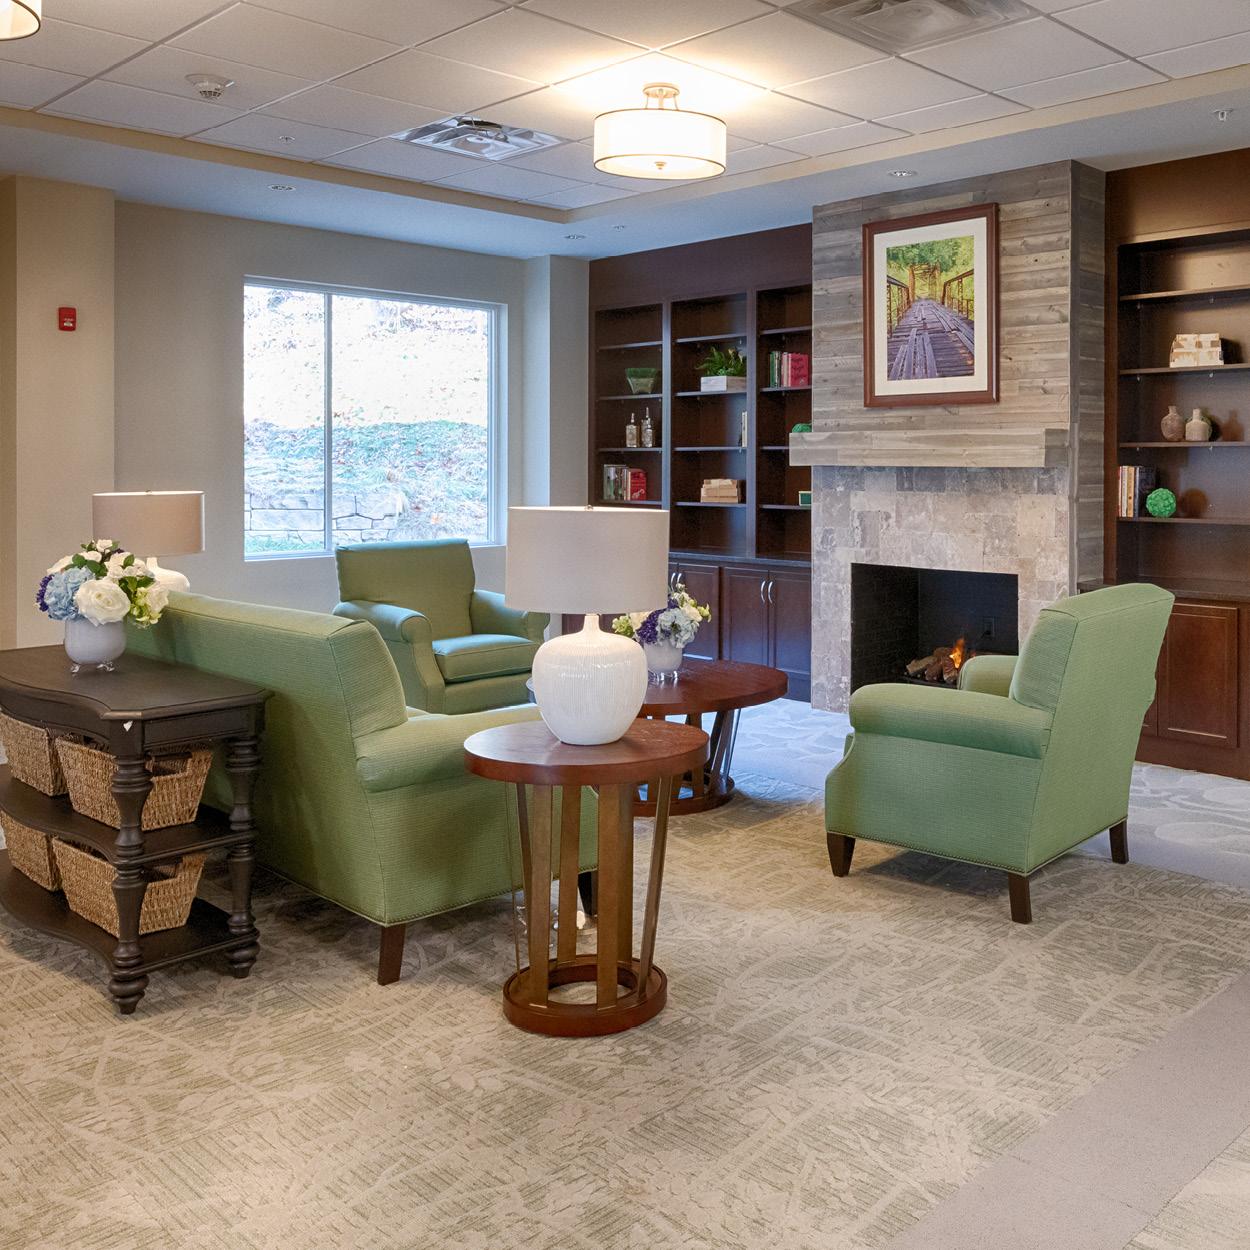 Stonerise Charleston sitting room with fireplace and bookshelves